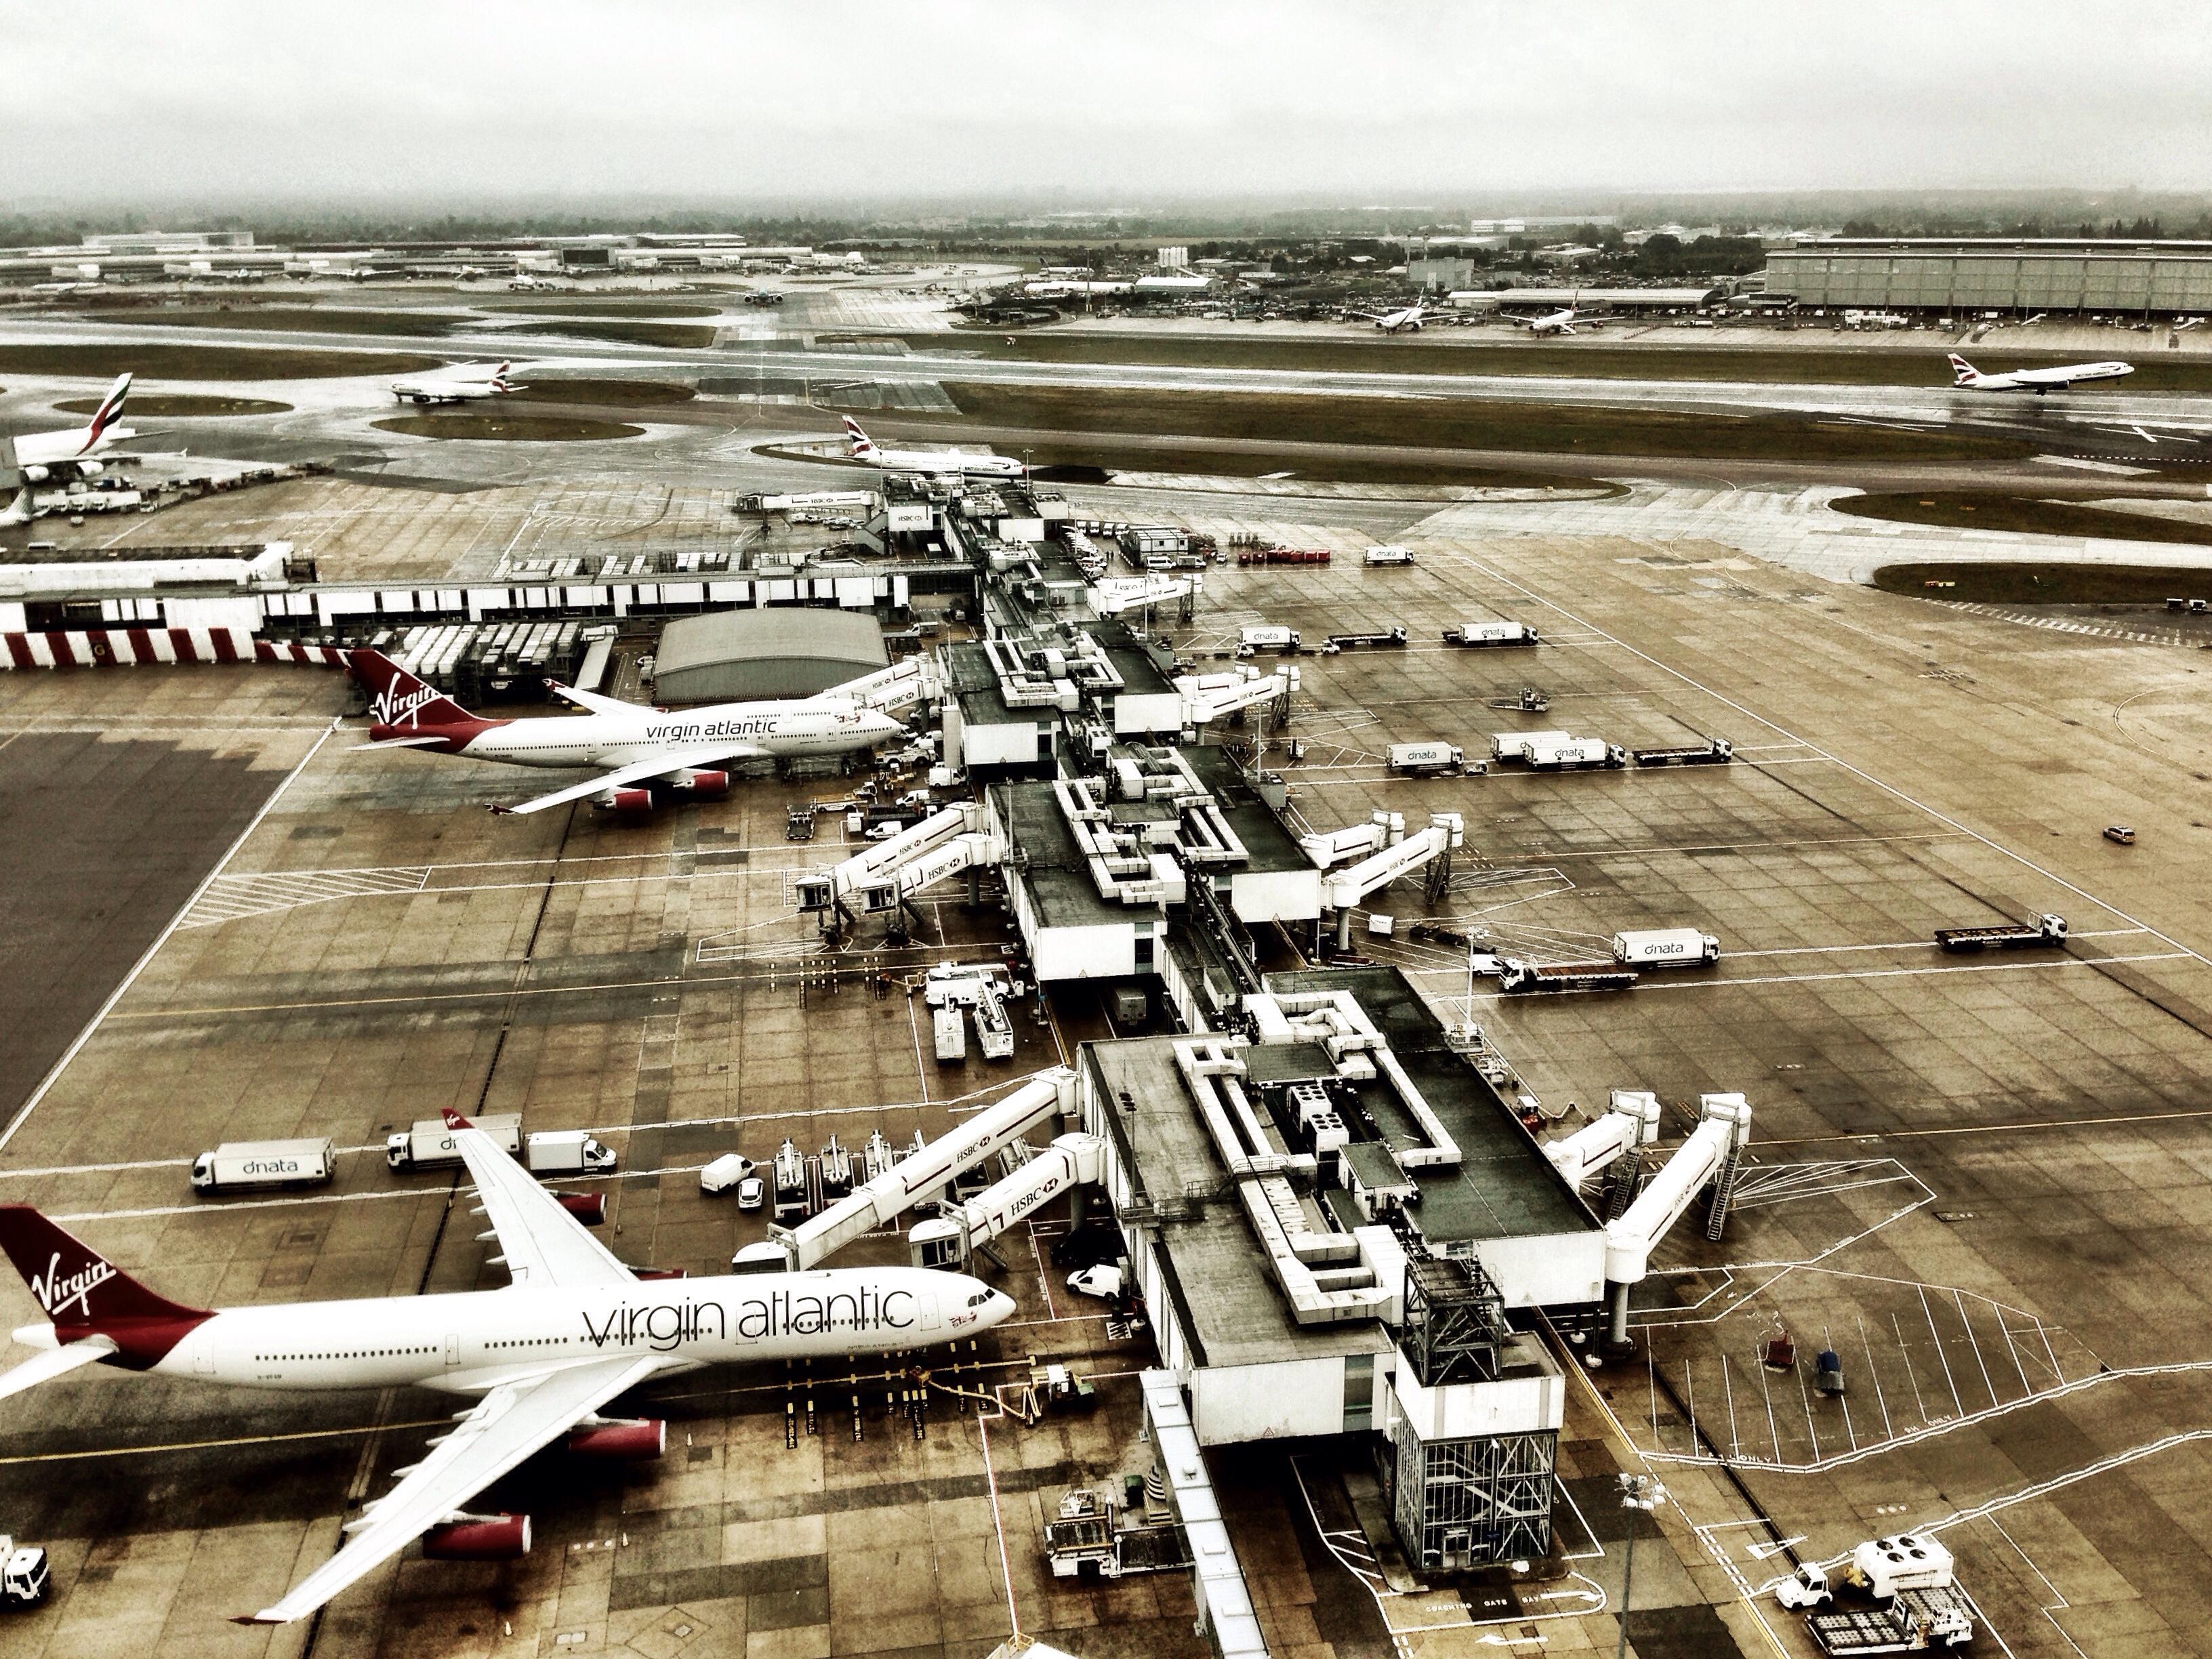 Wallpaper : sky, airplane, tower, iPhone, virgin, view